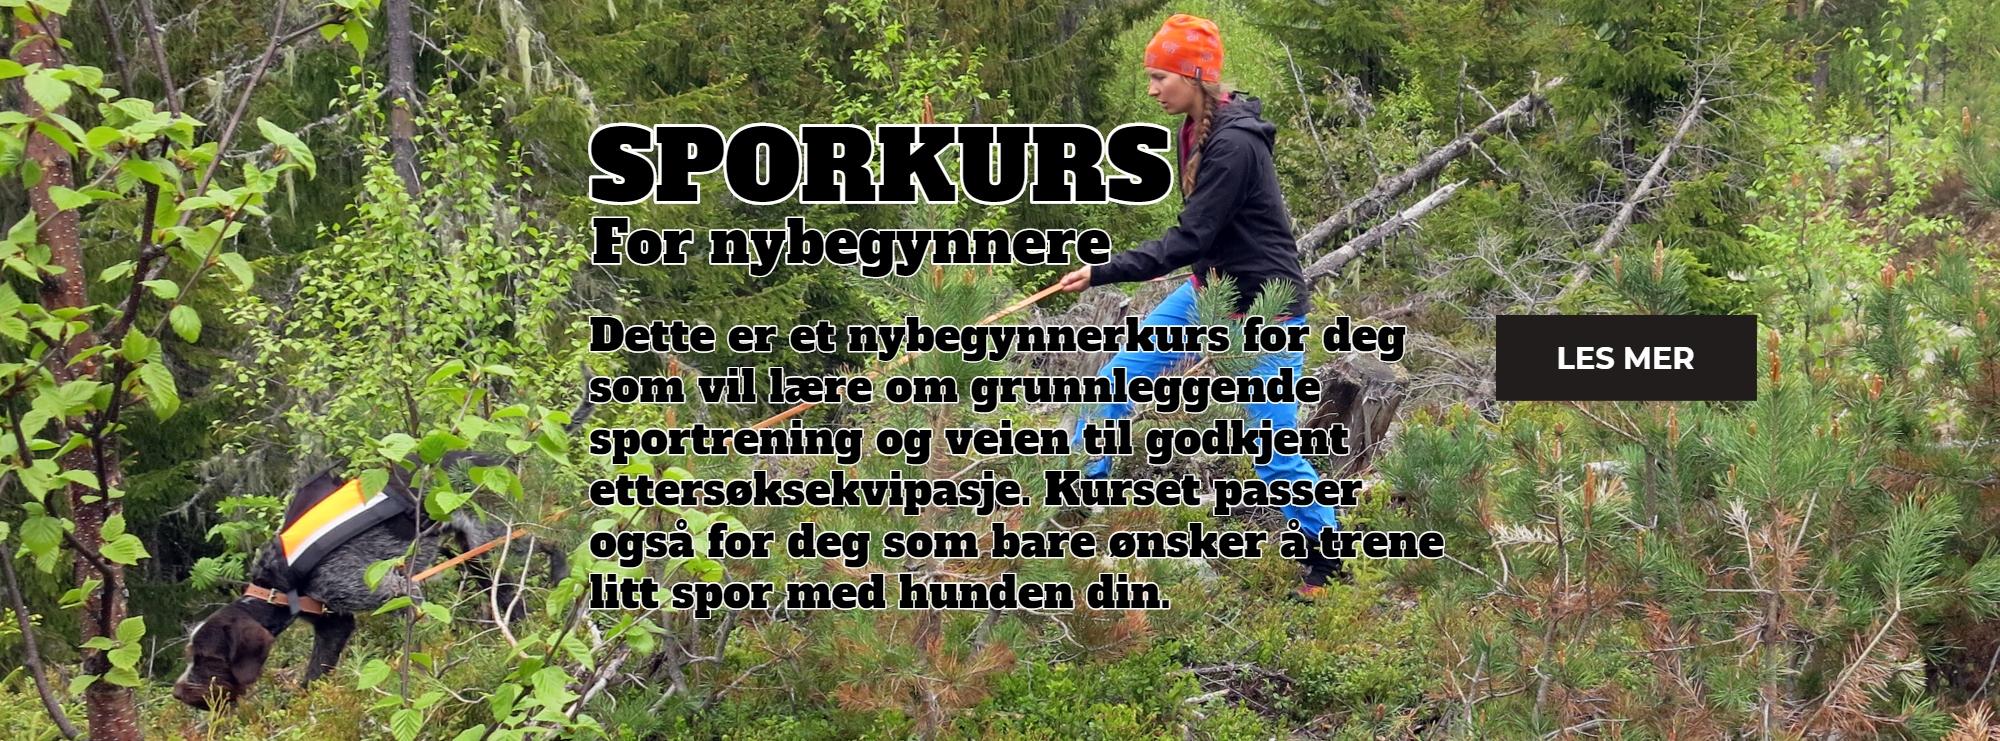 Sporkurs_GK